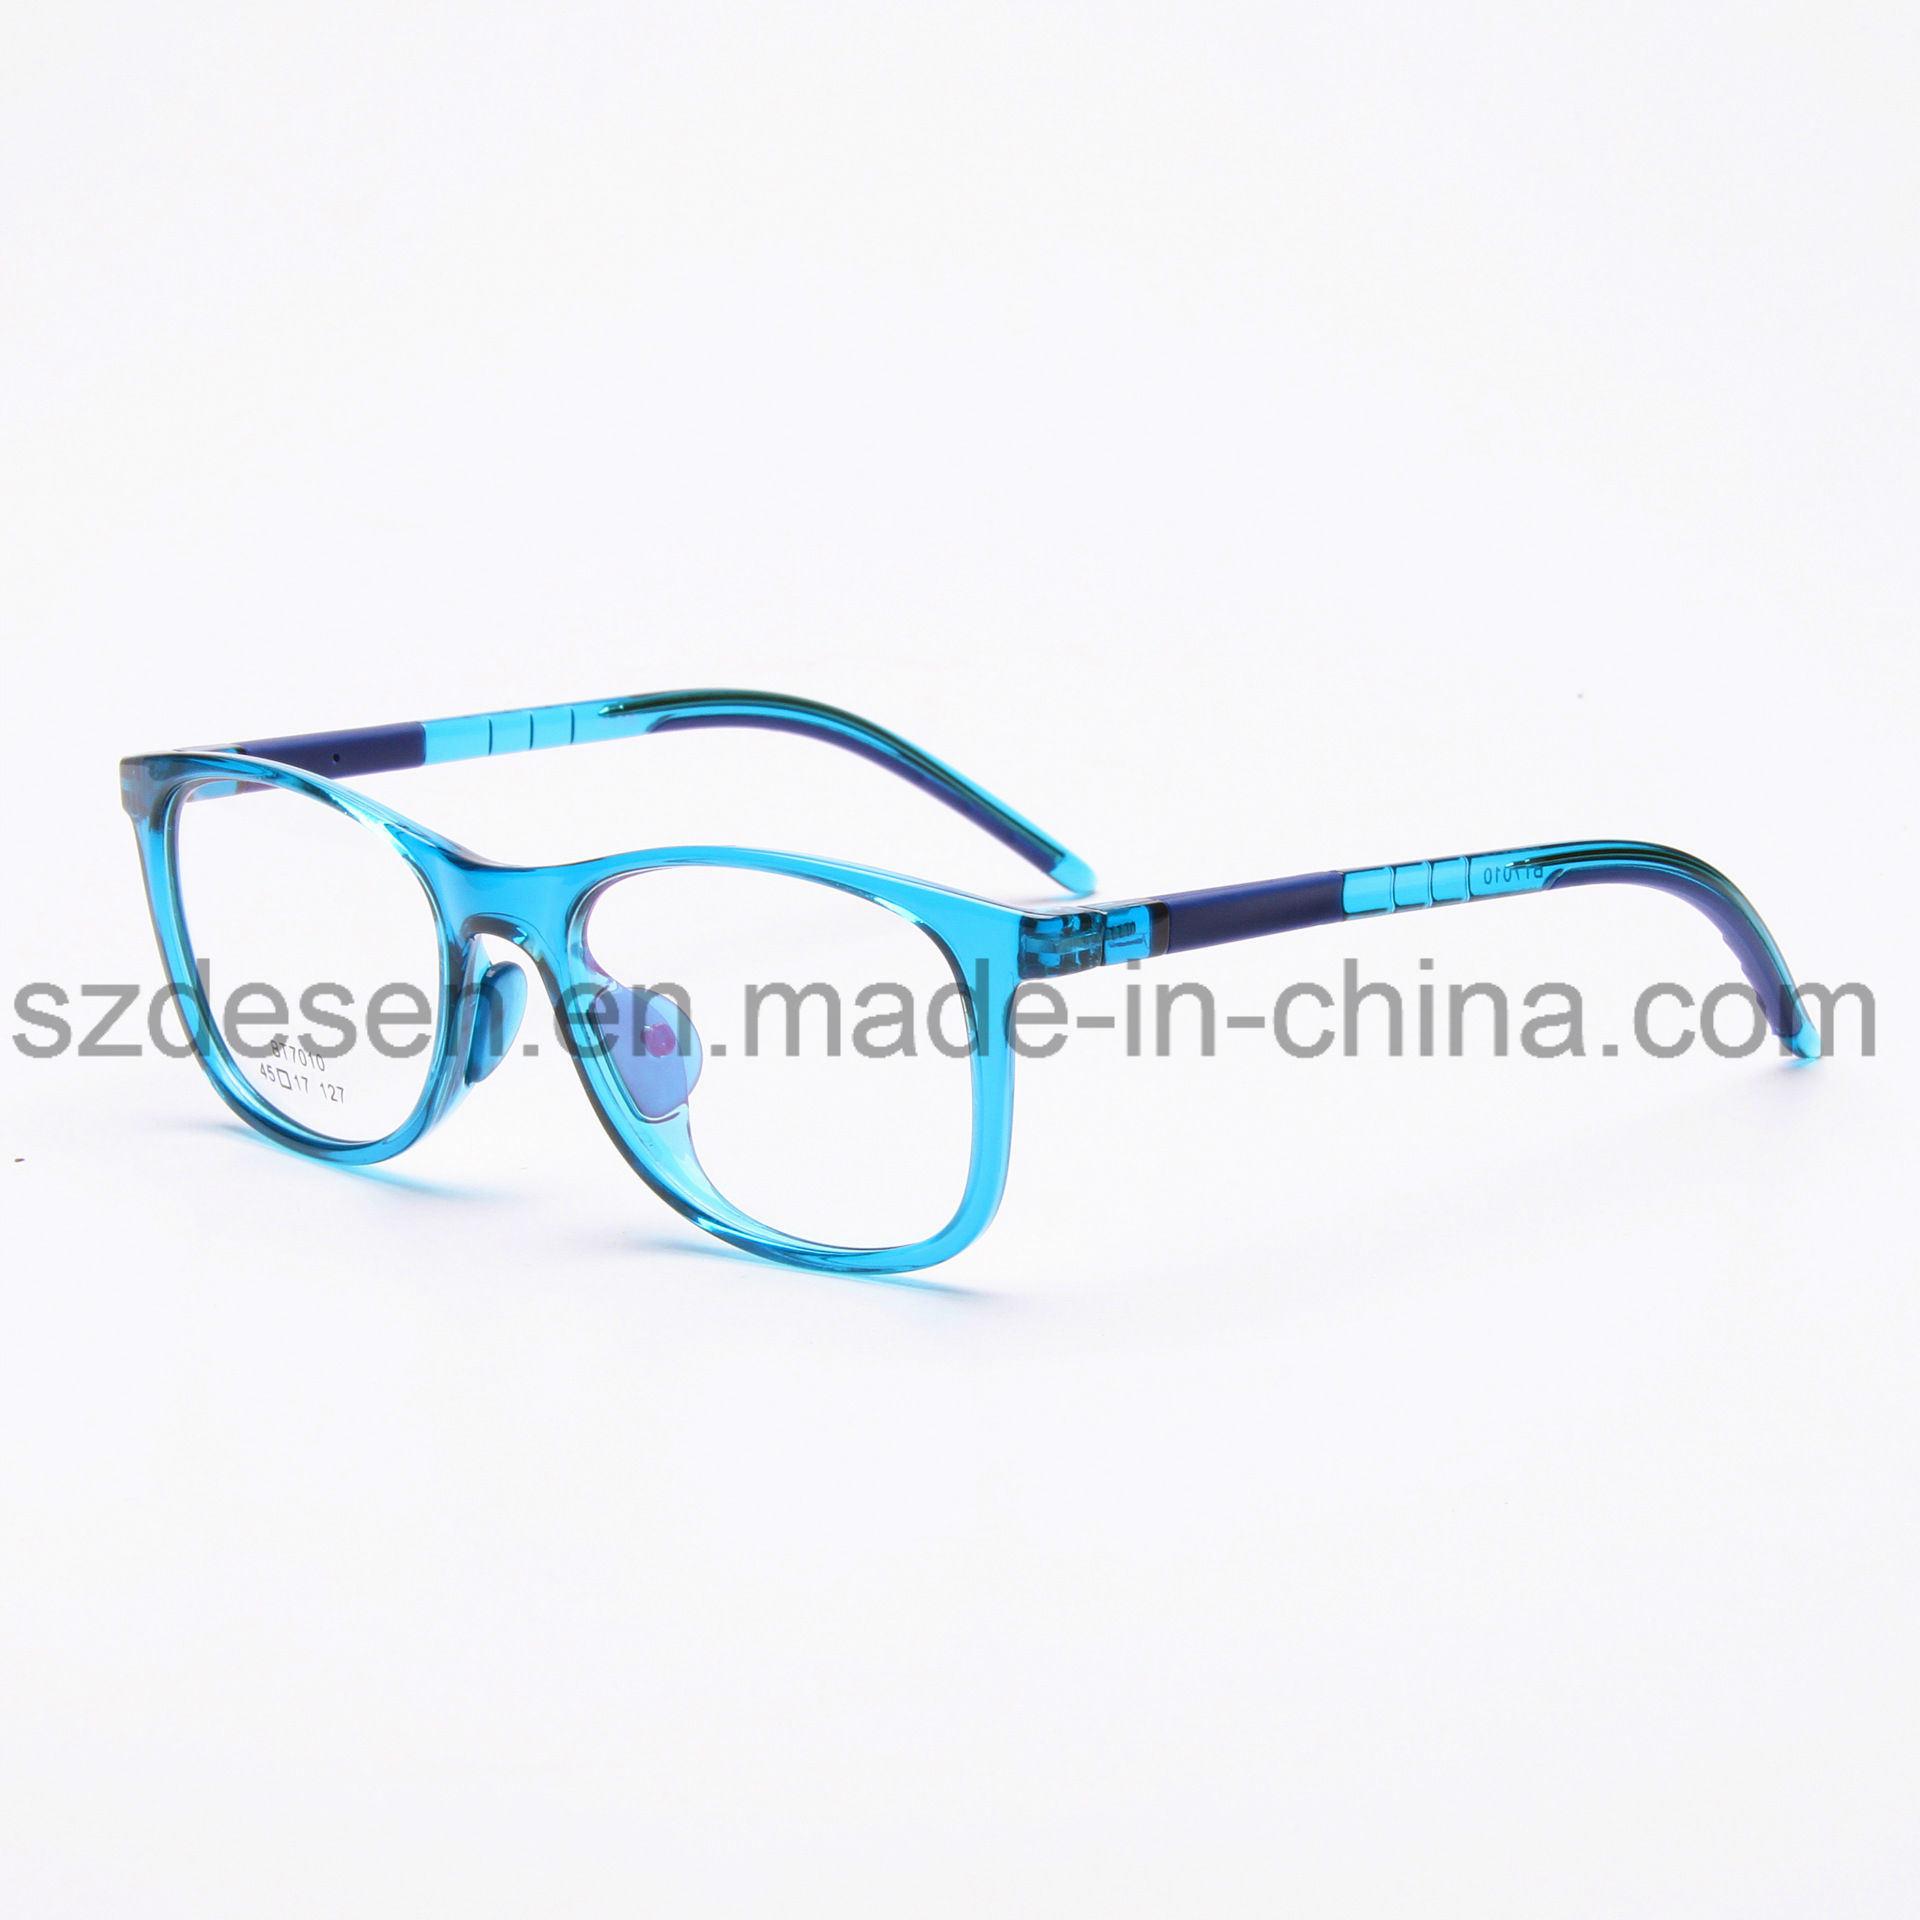 0afc9fbb01 China Low Price Wholesale Full Rim Tr90 Kids Eyewear Optical Frames - China  Glasses